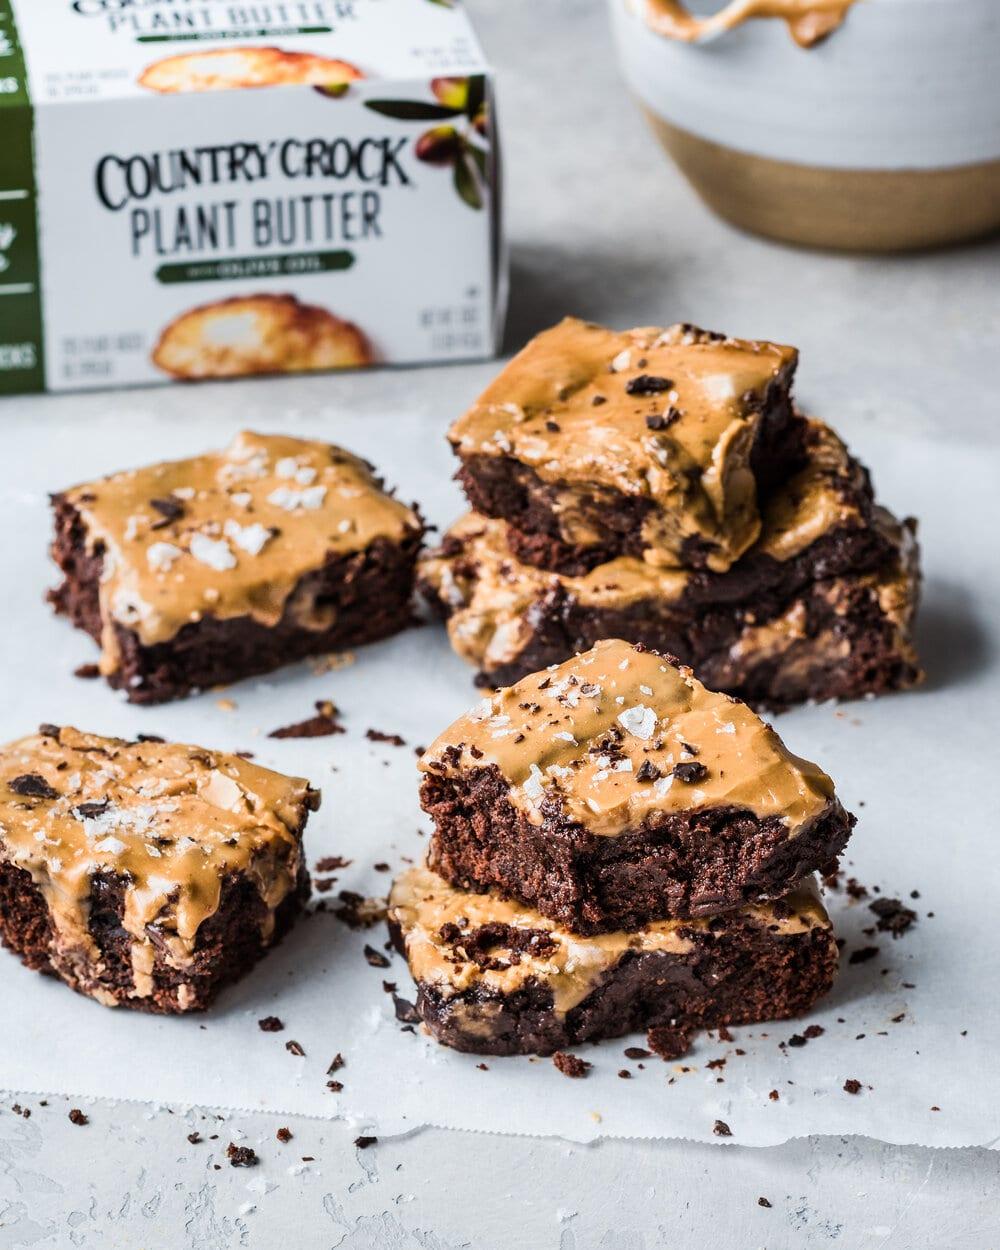 Vegan Gingerbread Brownies with Espresso Glaze